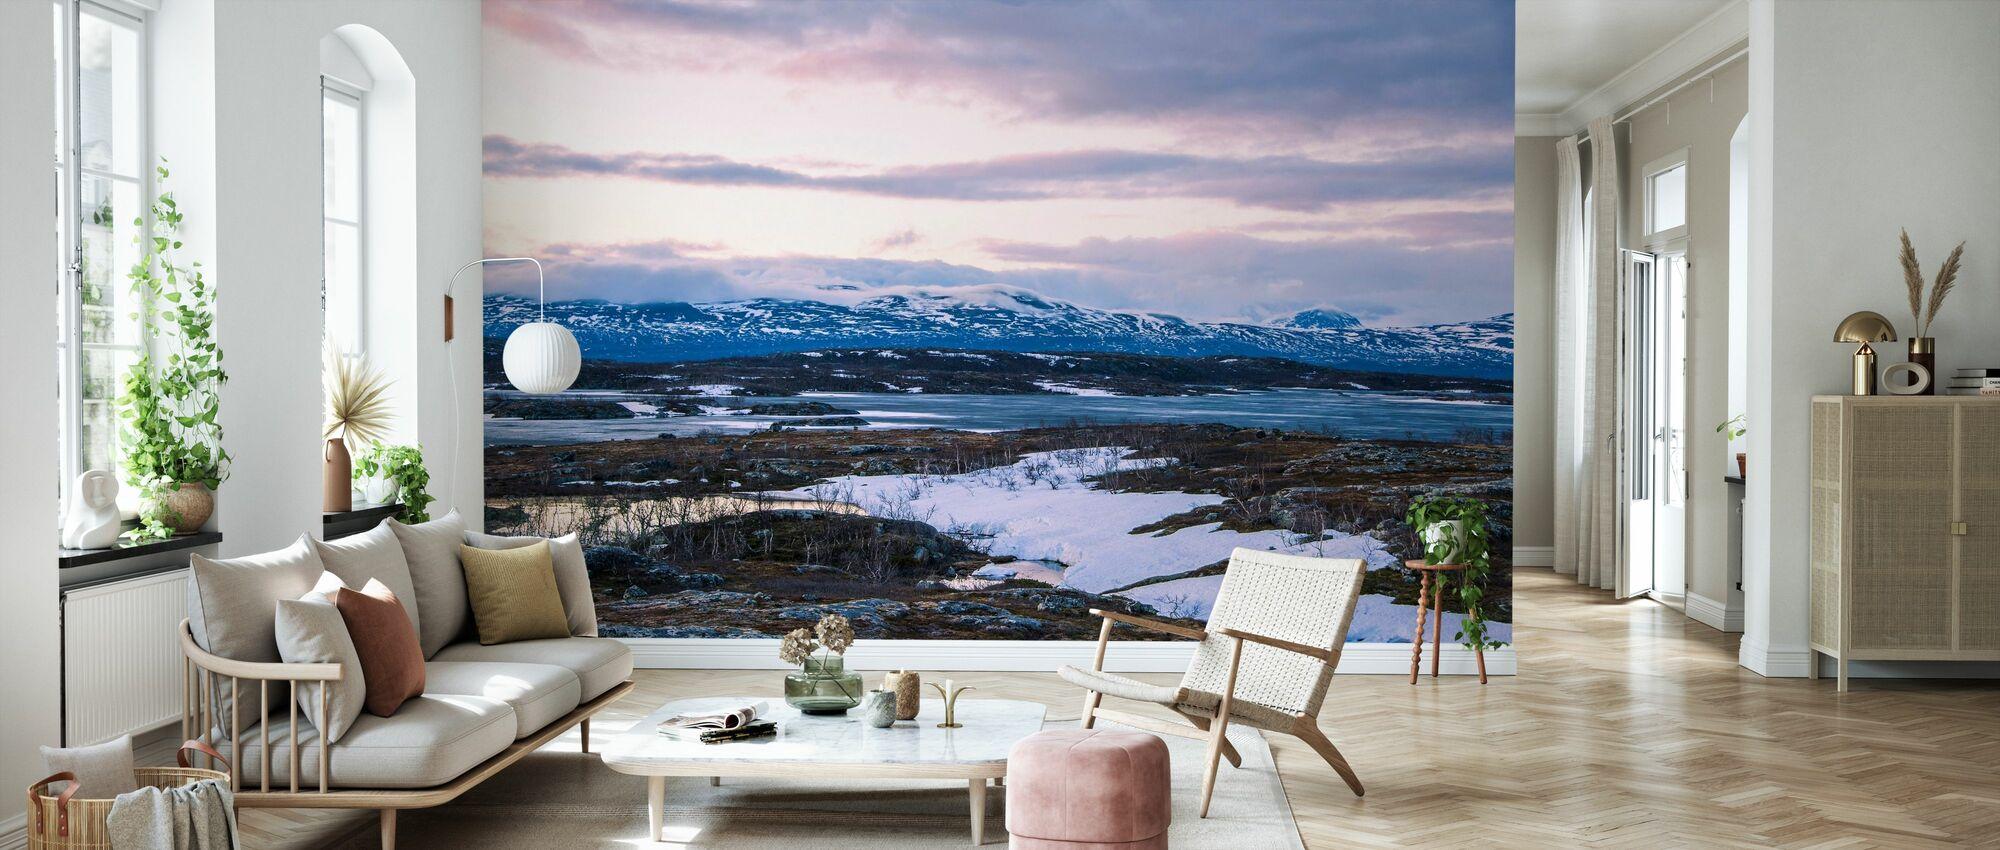 Northern Wilderness - Wallpaper - Living Room